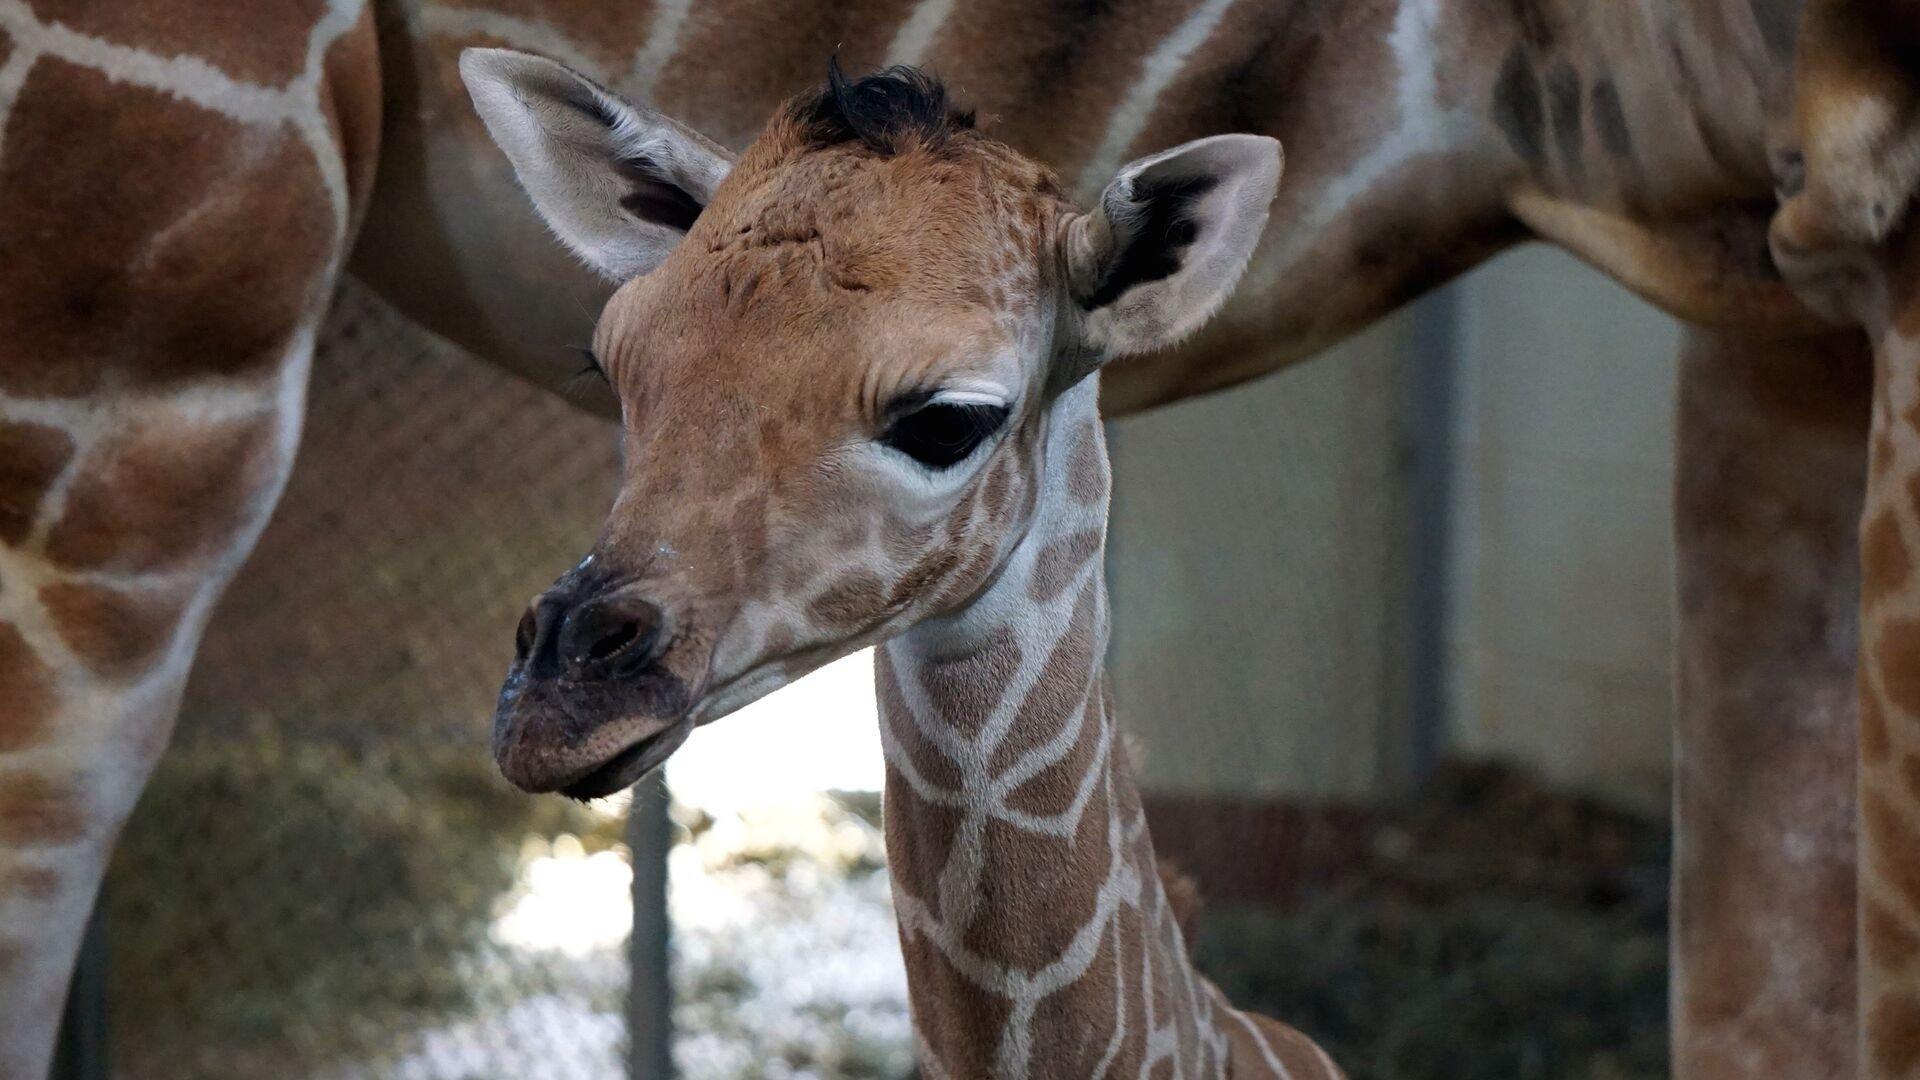 The Cheyenne Mountain Zoo welcomes a new giraffe calf born April 26th.